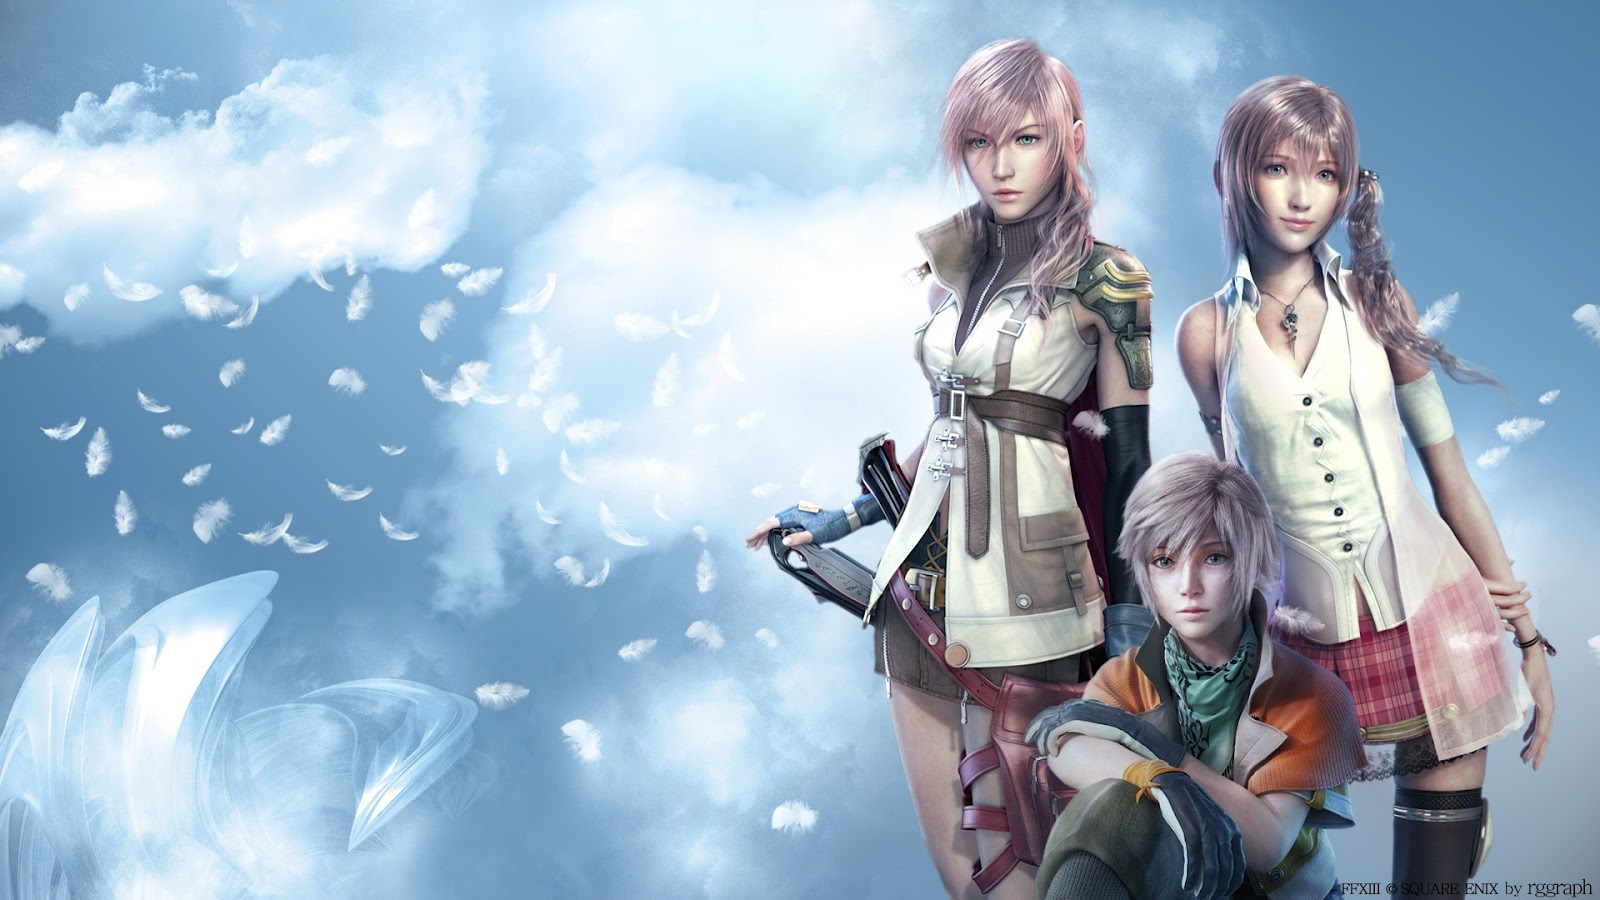 Free Download Final Fantasy Xiii Wallpaper 1920x1080 Wallpaperhere